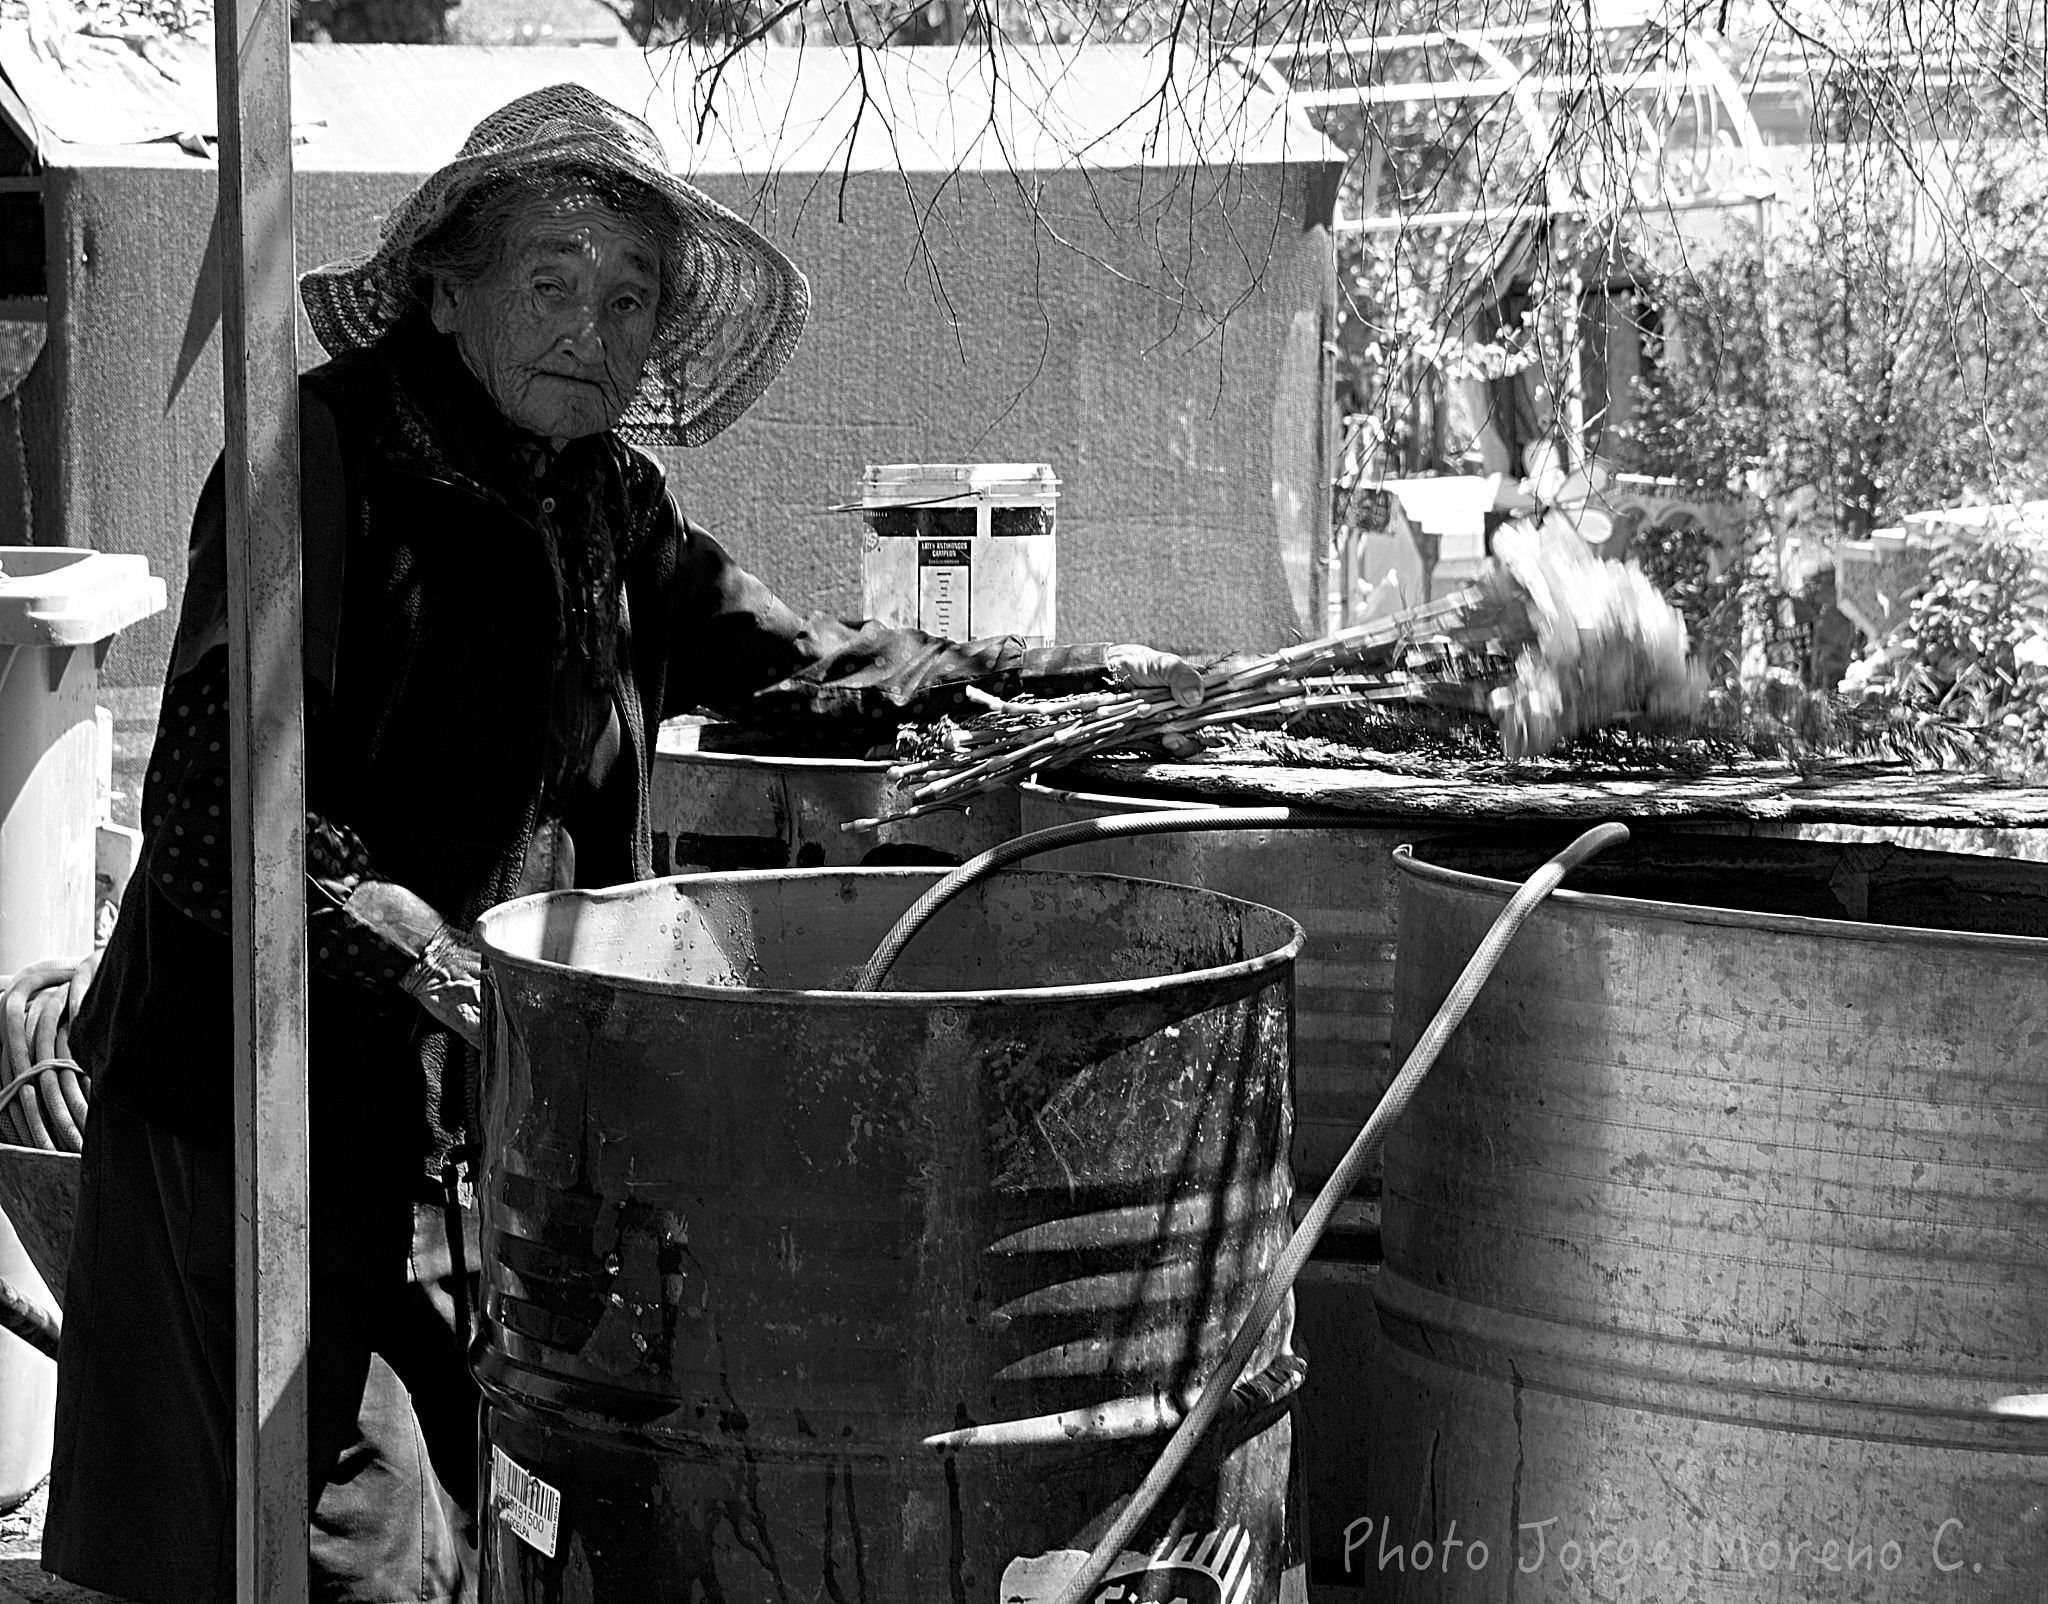 OLD WOMAN by Jorge Ricardo Moreno Contreras